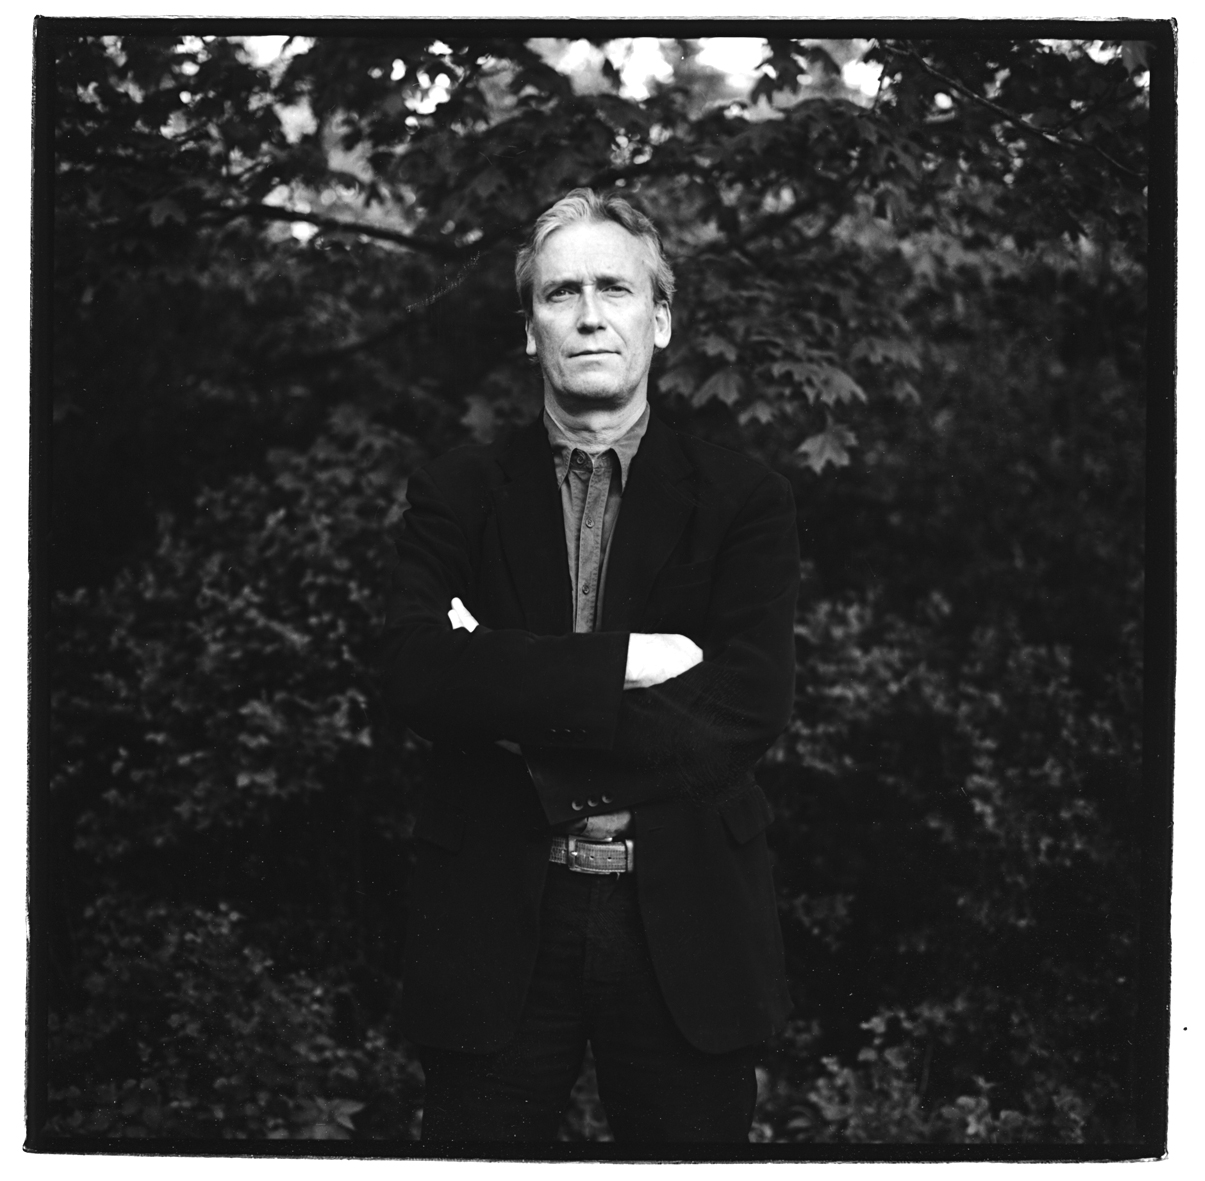 Festivalforfattar  i  2012  –  Ragnar  Hovland